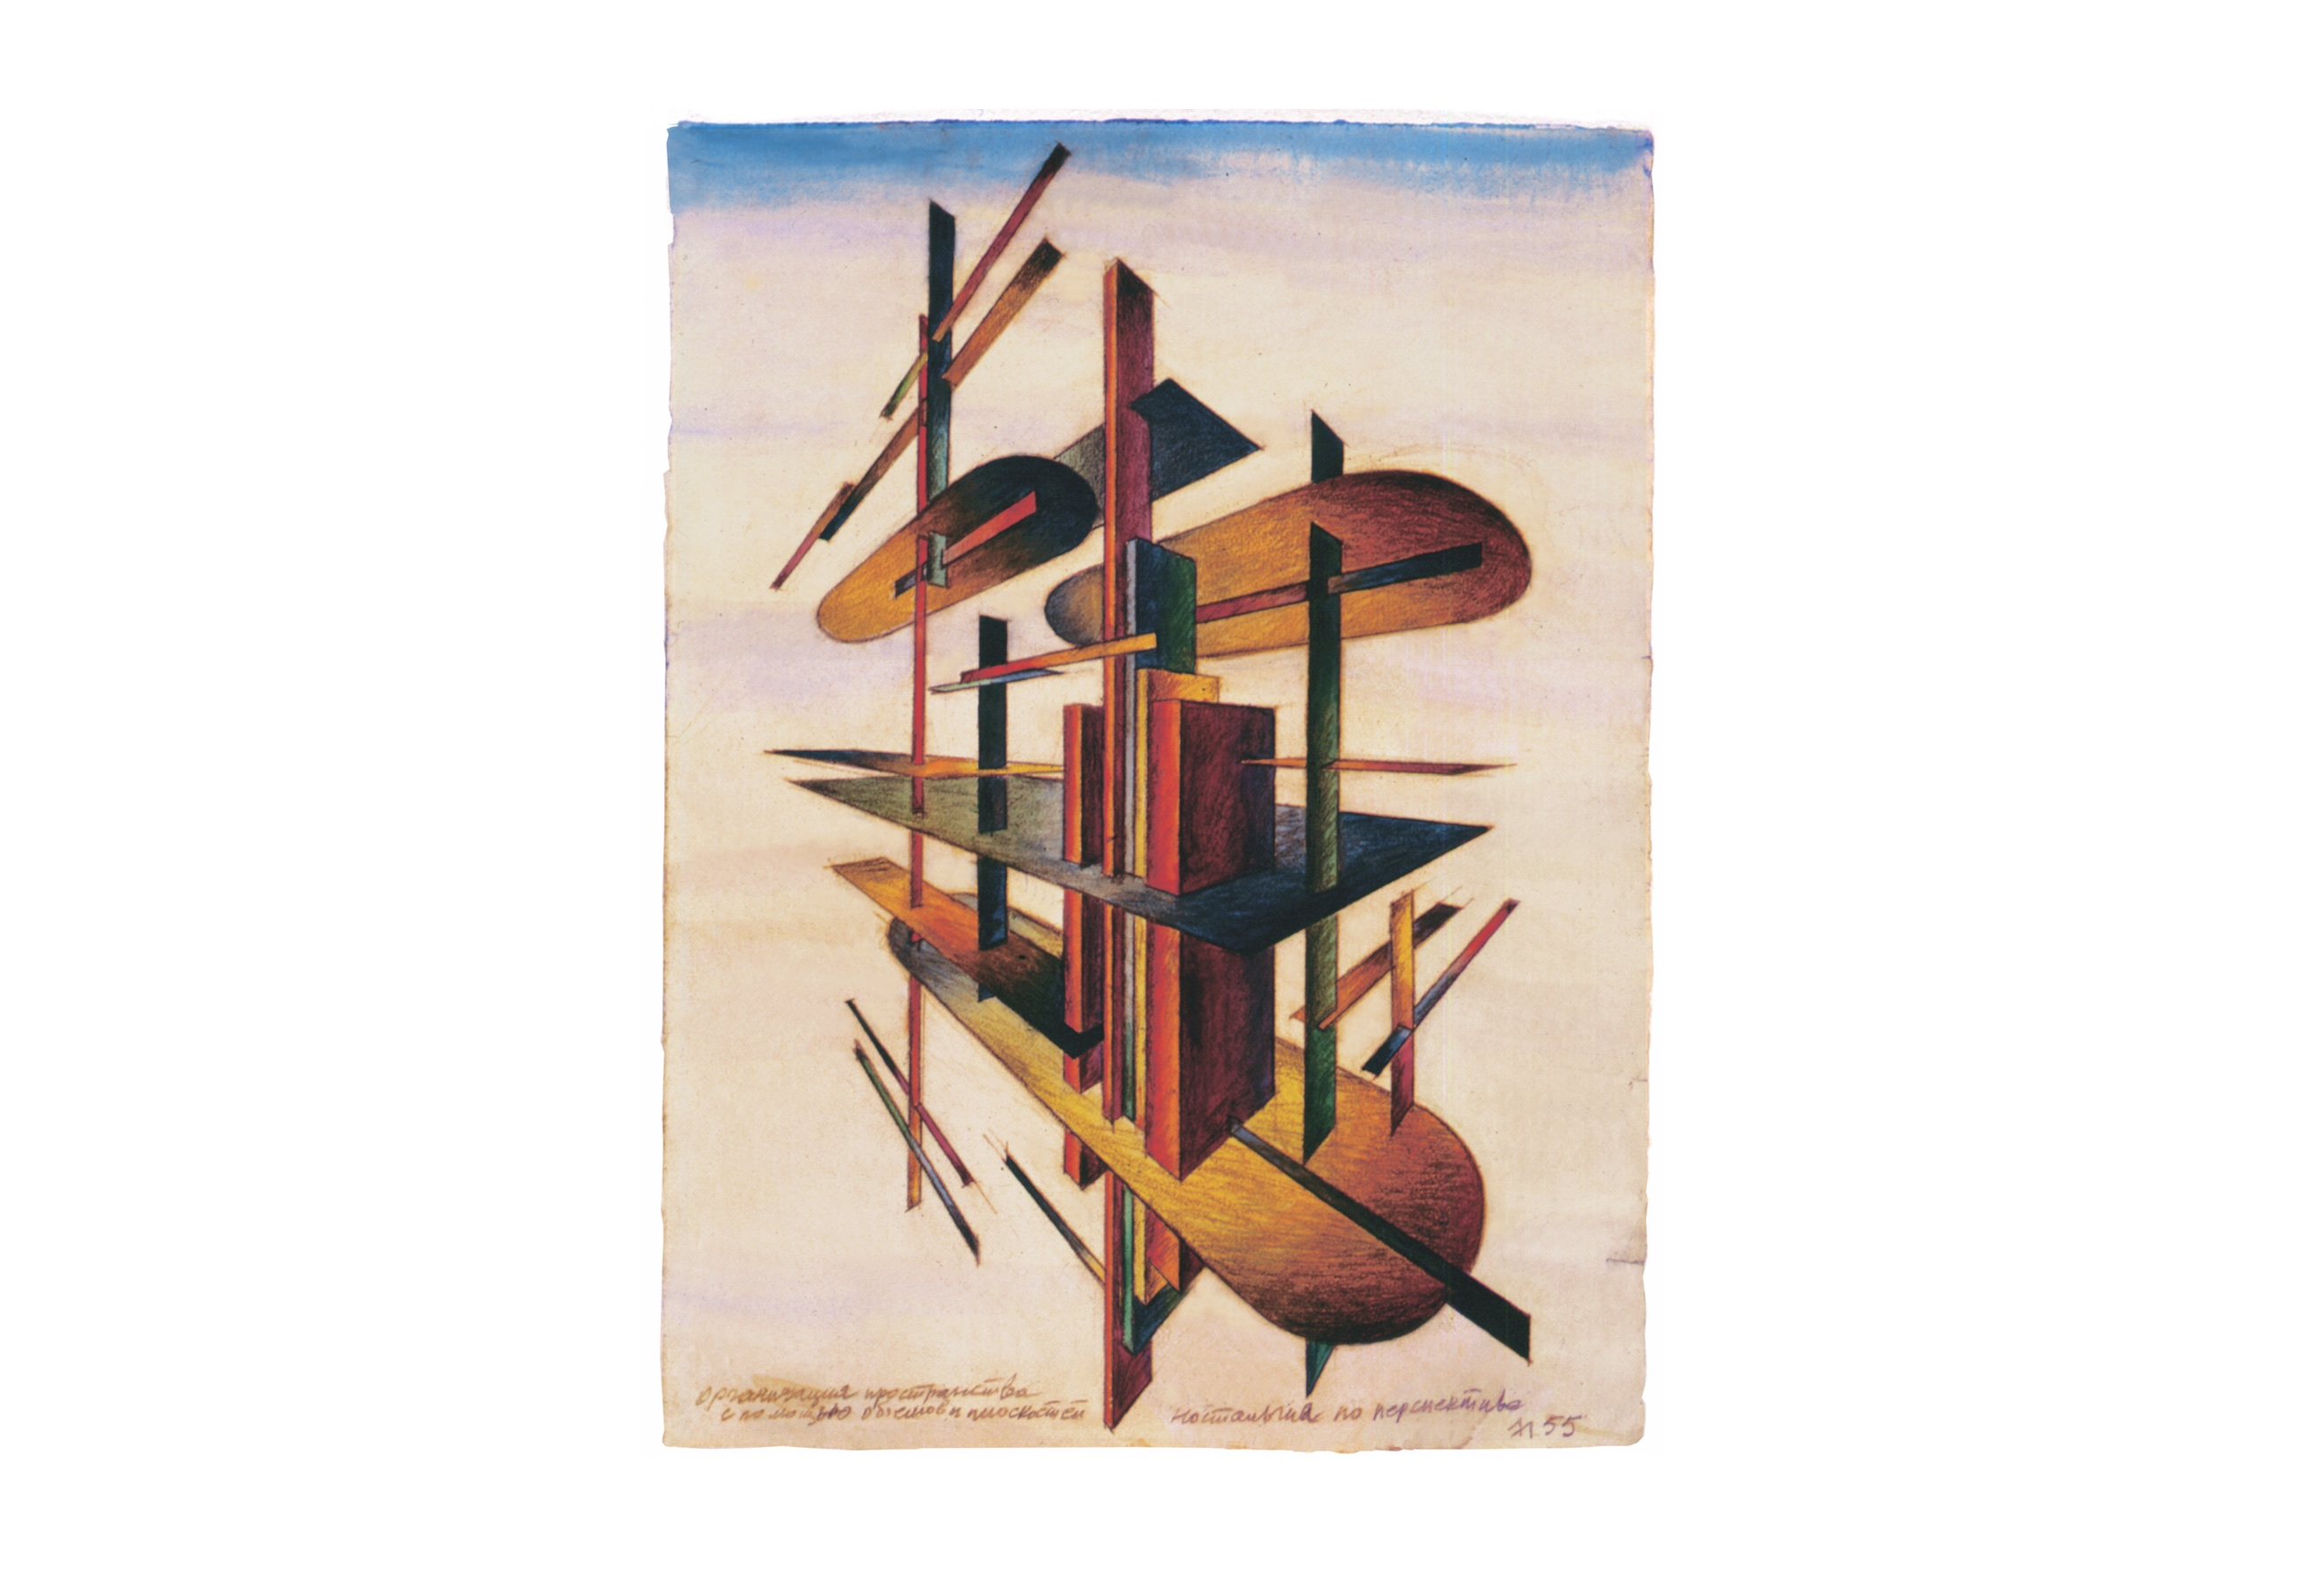 Lamm-Portfolio-1954-1955-28.jpg